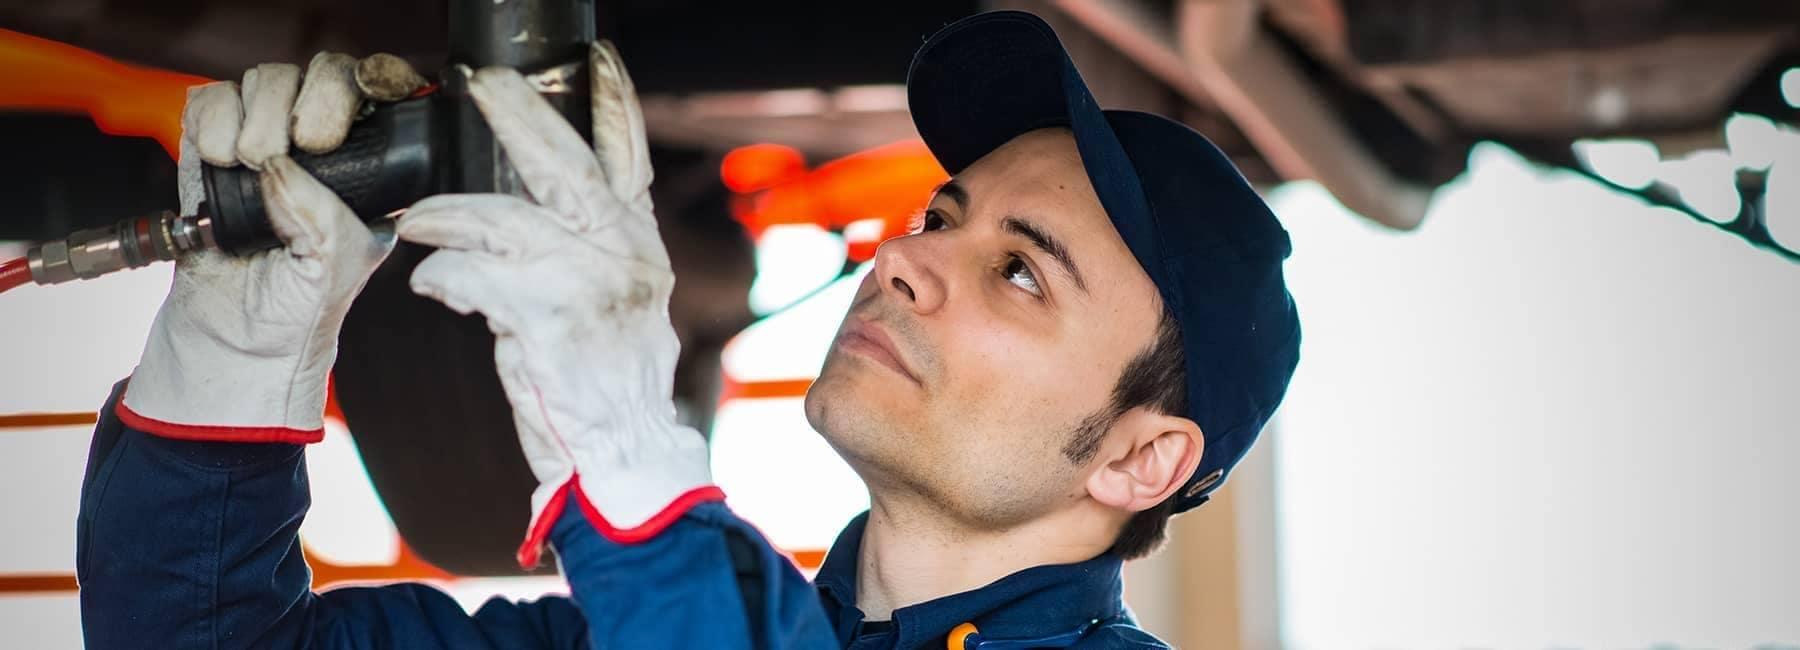 technician repairing under car